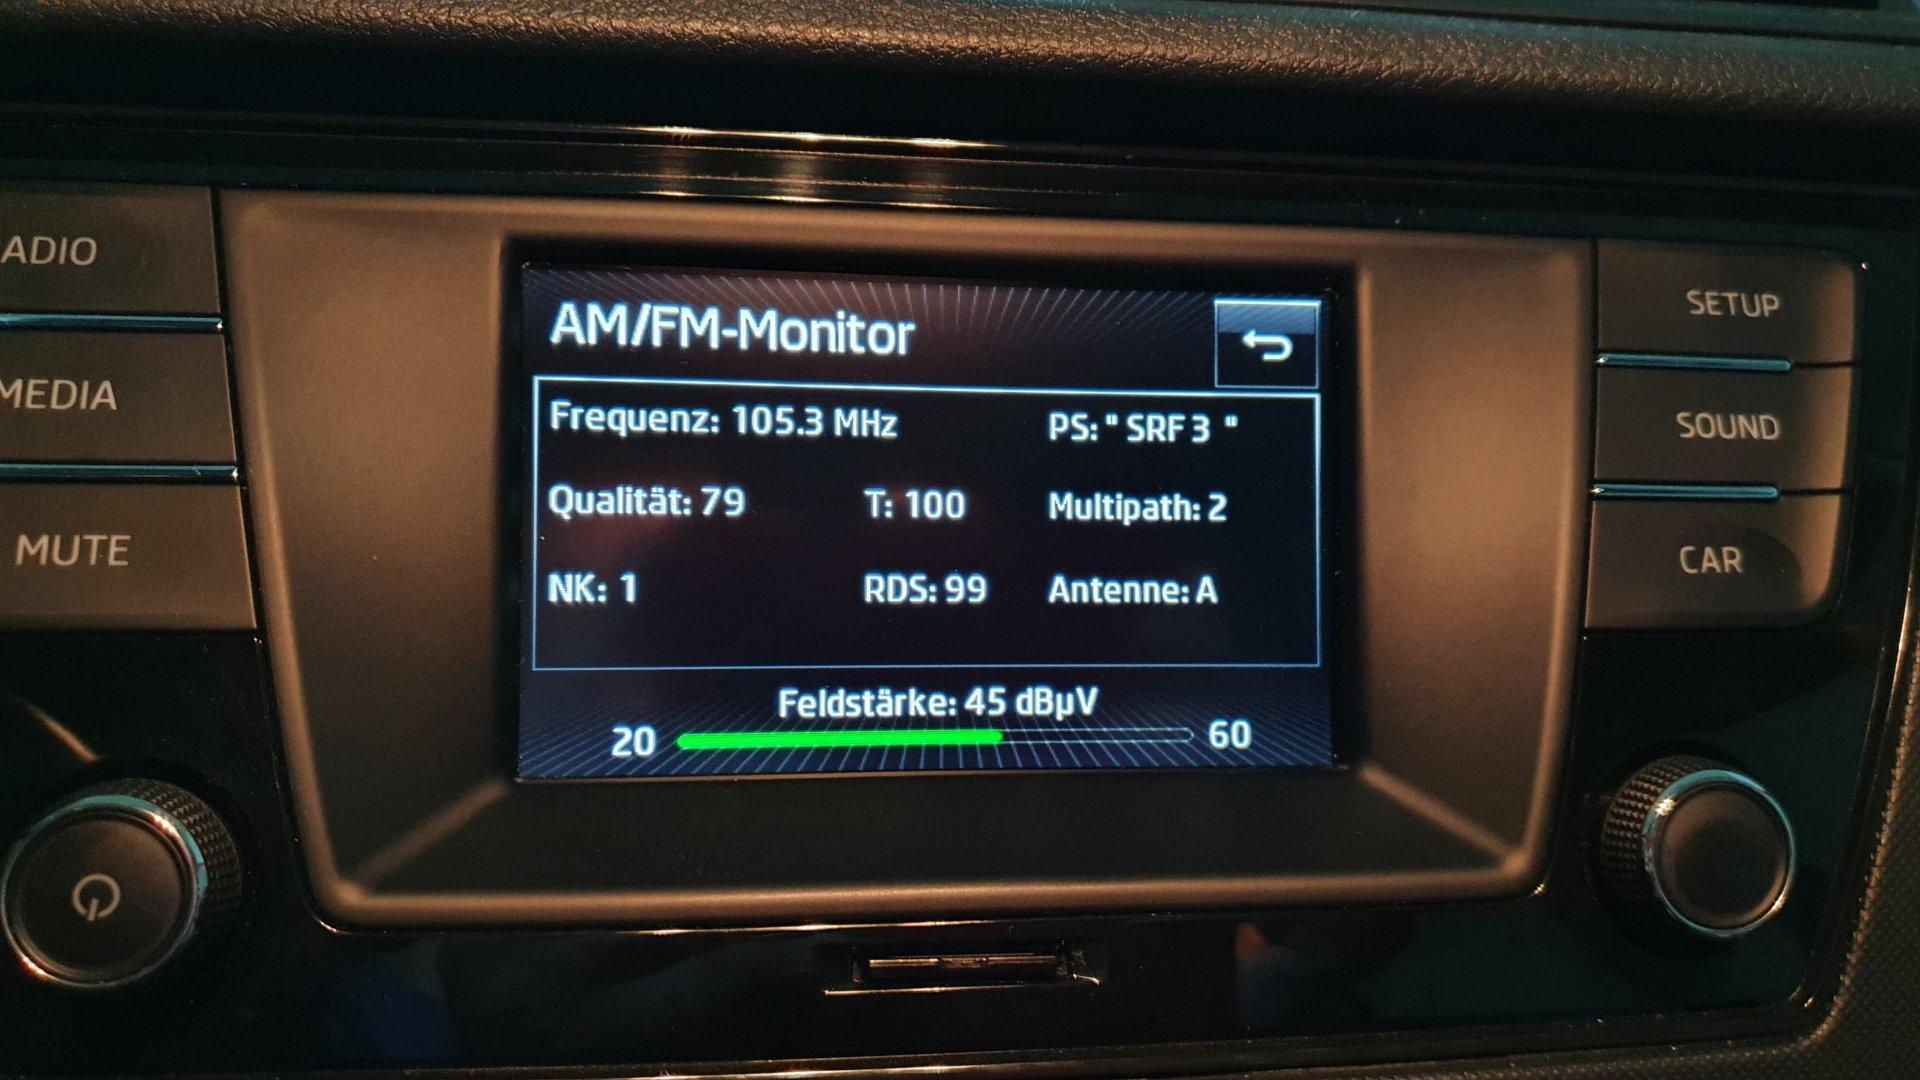 Skoda Fabia 3 - FM-Radio-Monitor.jpg